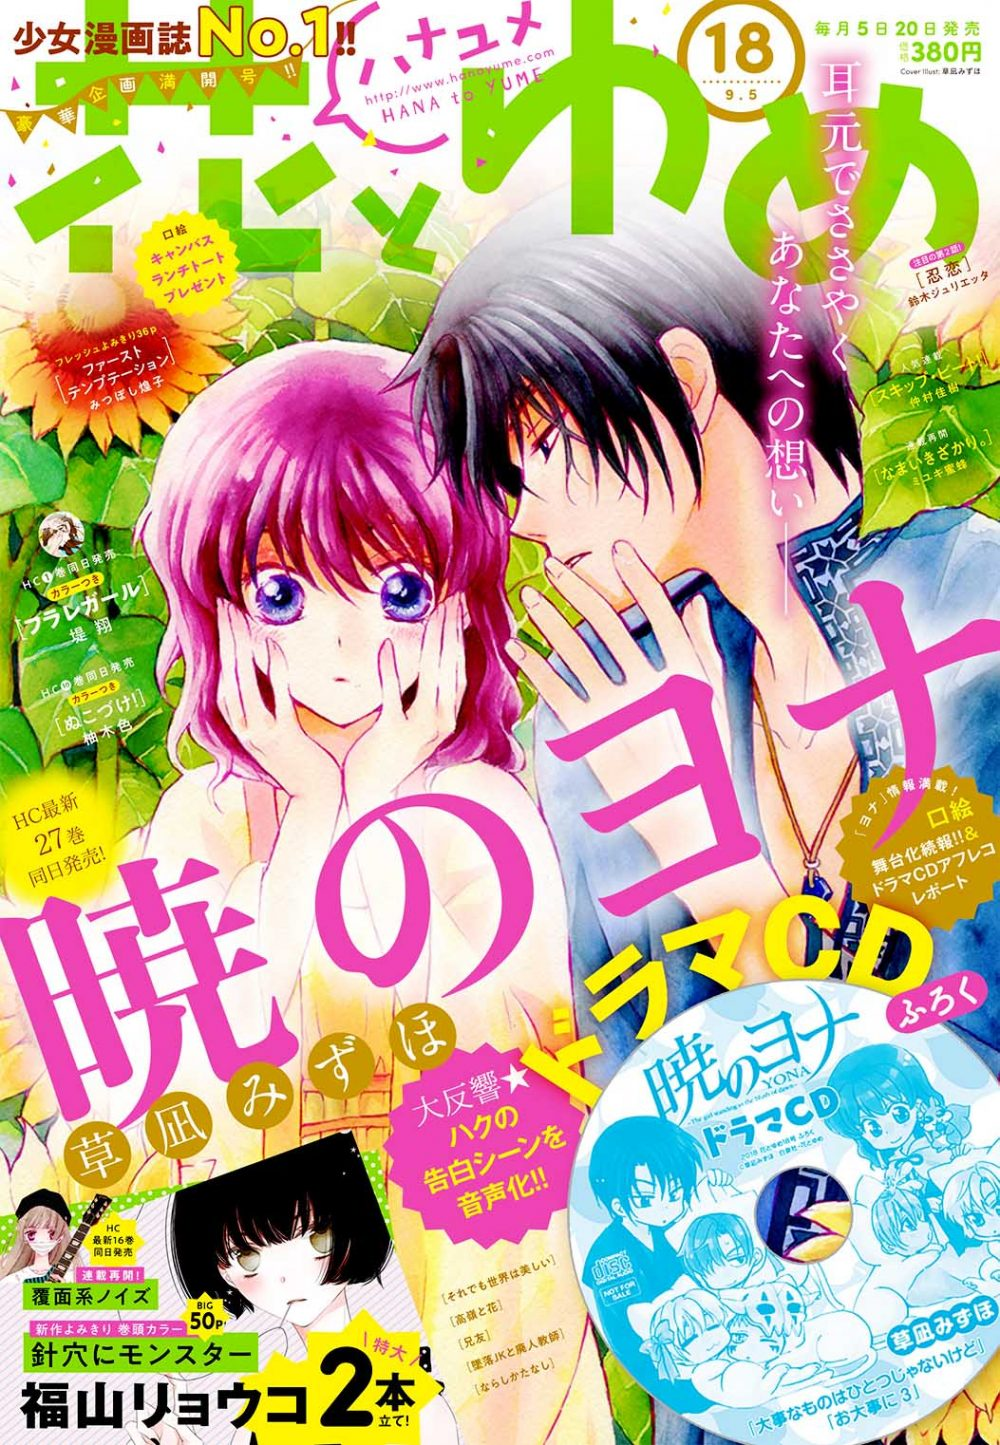 Hana to Yume 18 (agosto 2018), copertina, illustrazione di Mizuho Kusanagi